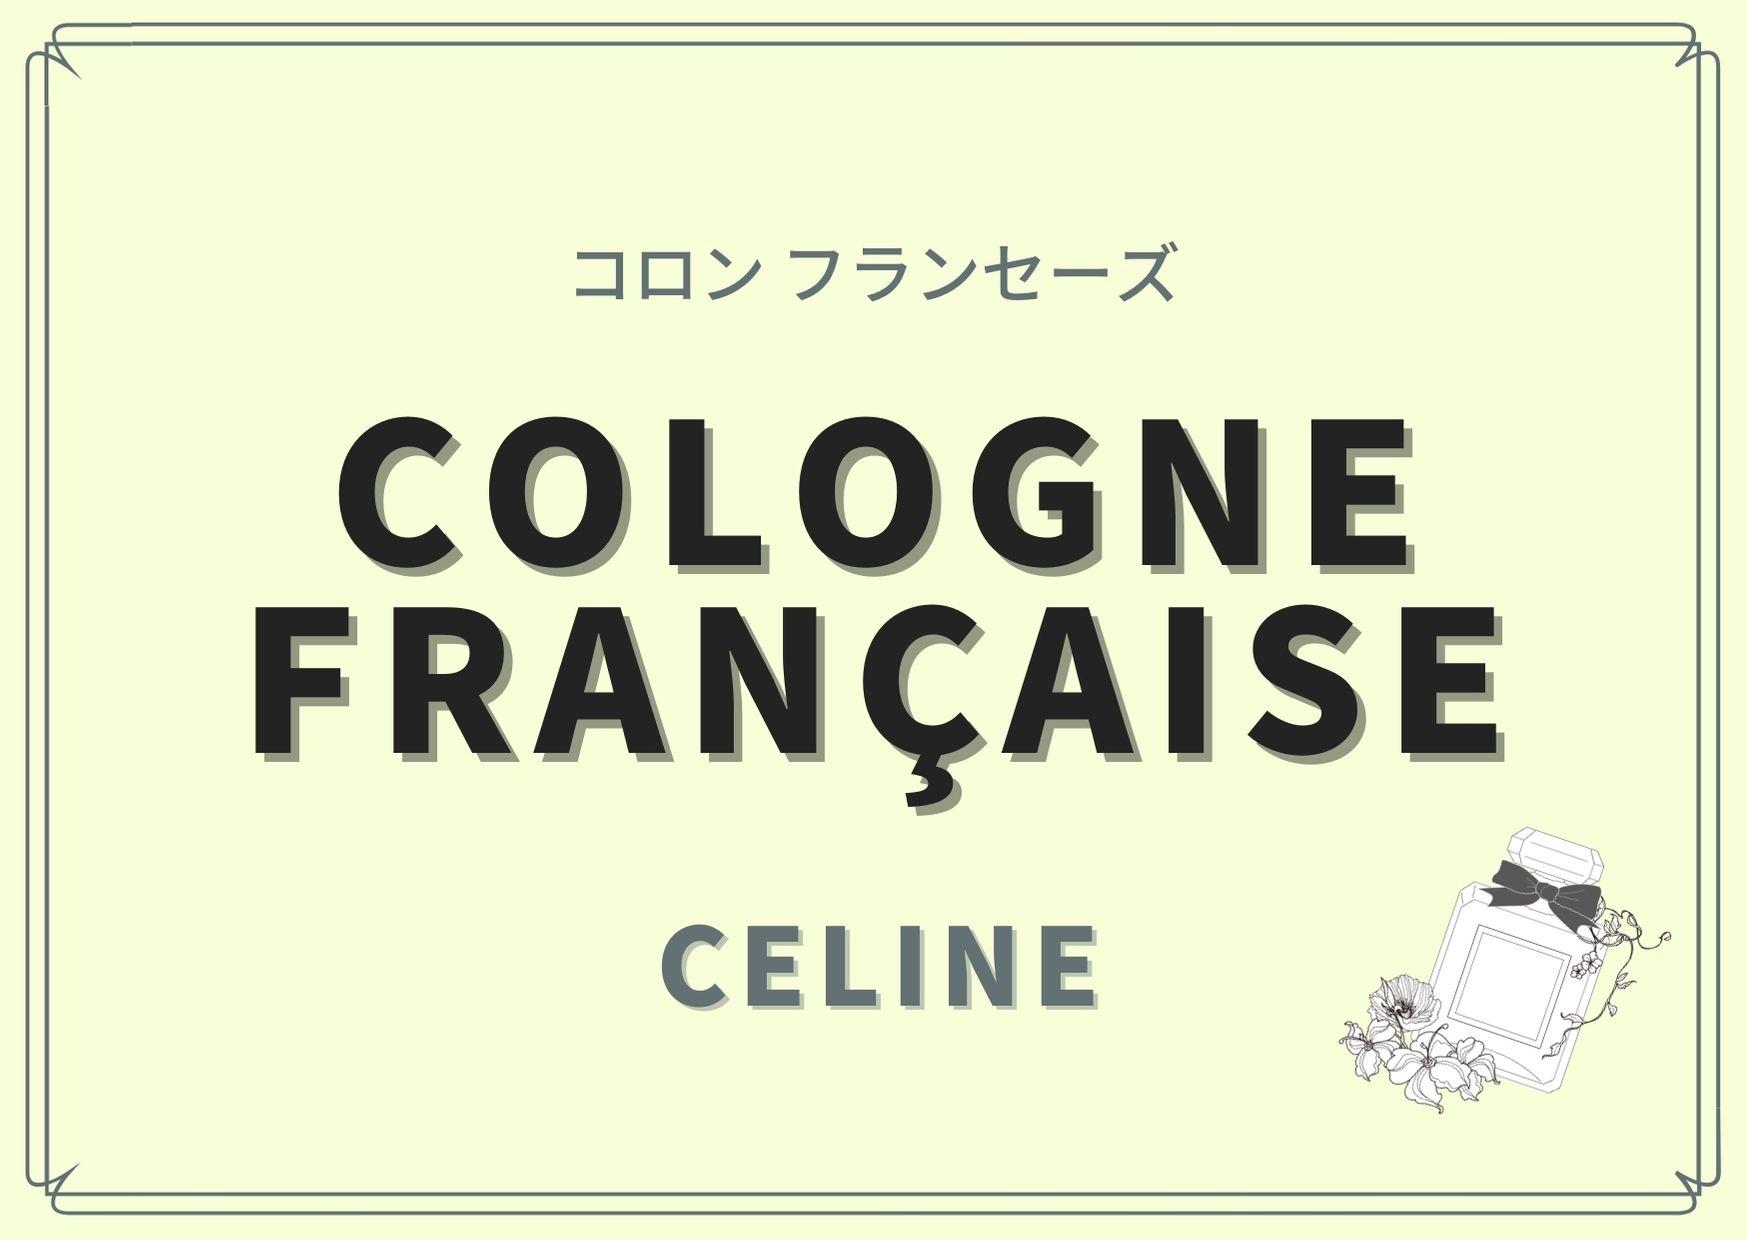 COLOGNE FRANÇAISE(コロン フランセーズ)/CELINE(セリーヌ)